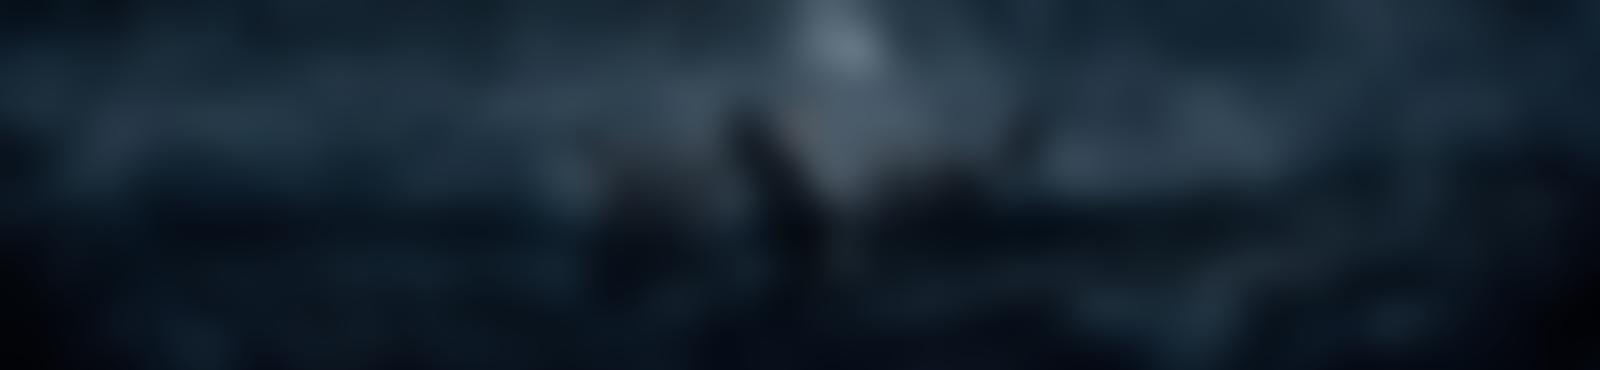 Blurred 94544bef 0583 476c 946b ee3252d6b991